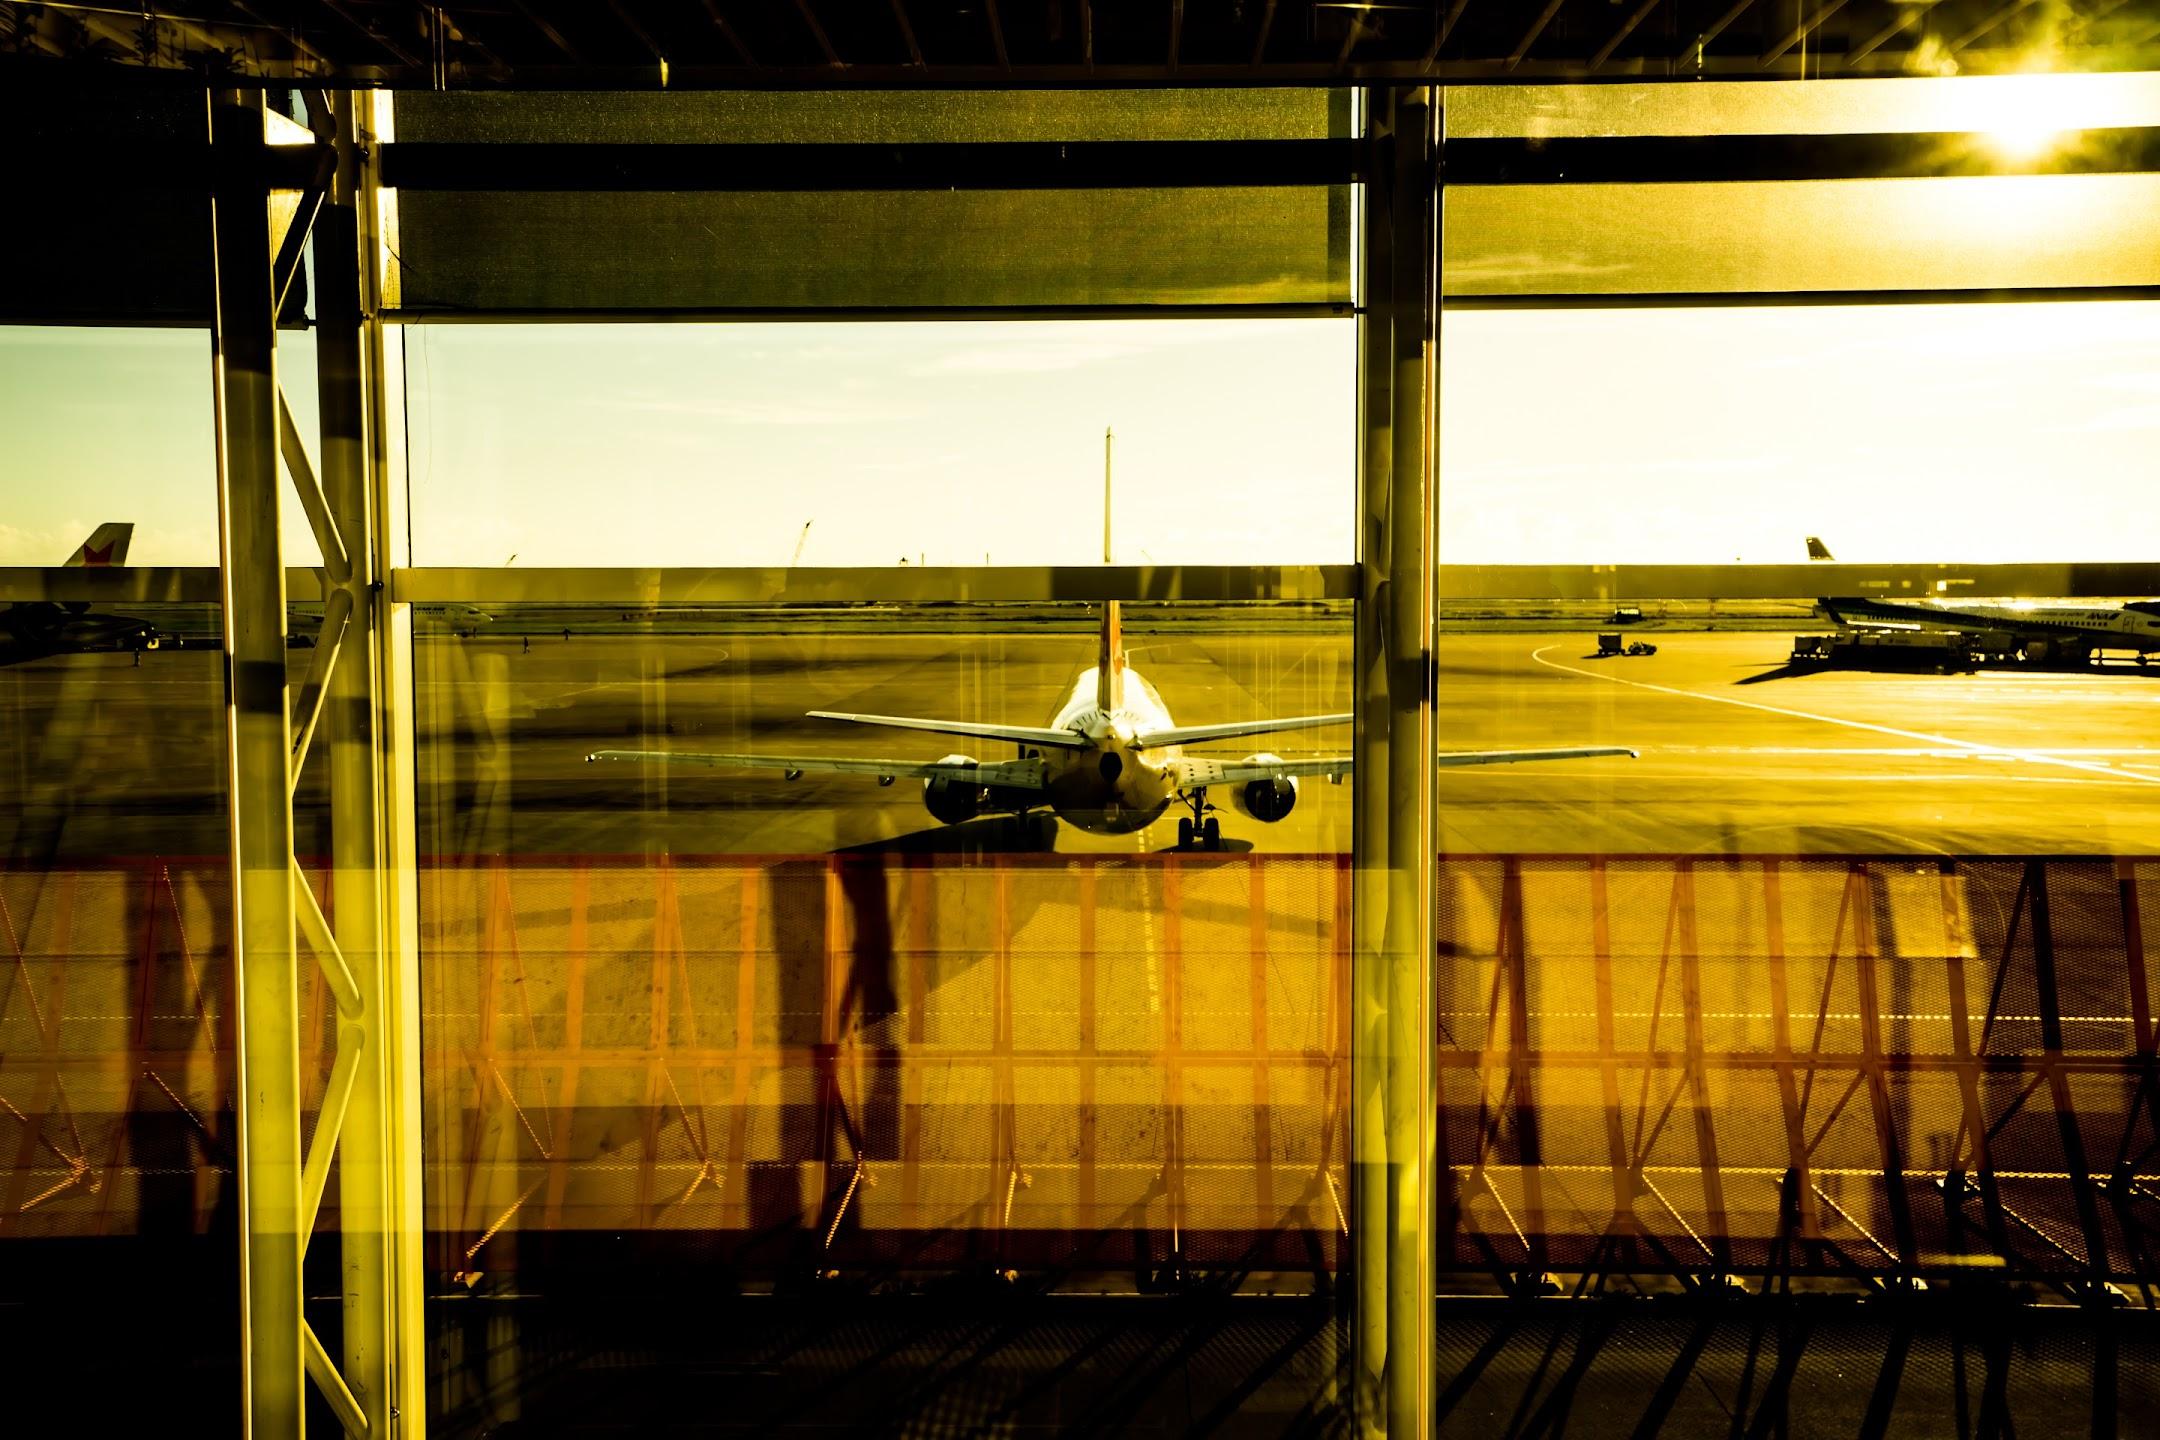 Okinawa Naha airport airplane1